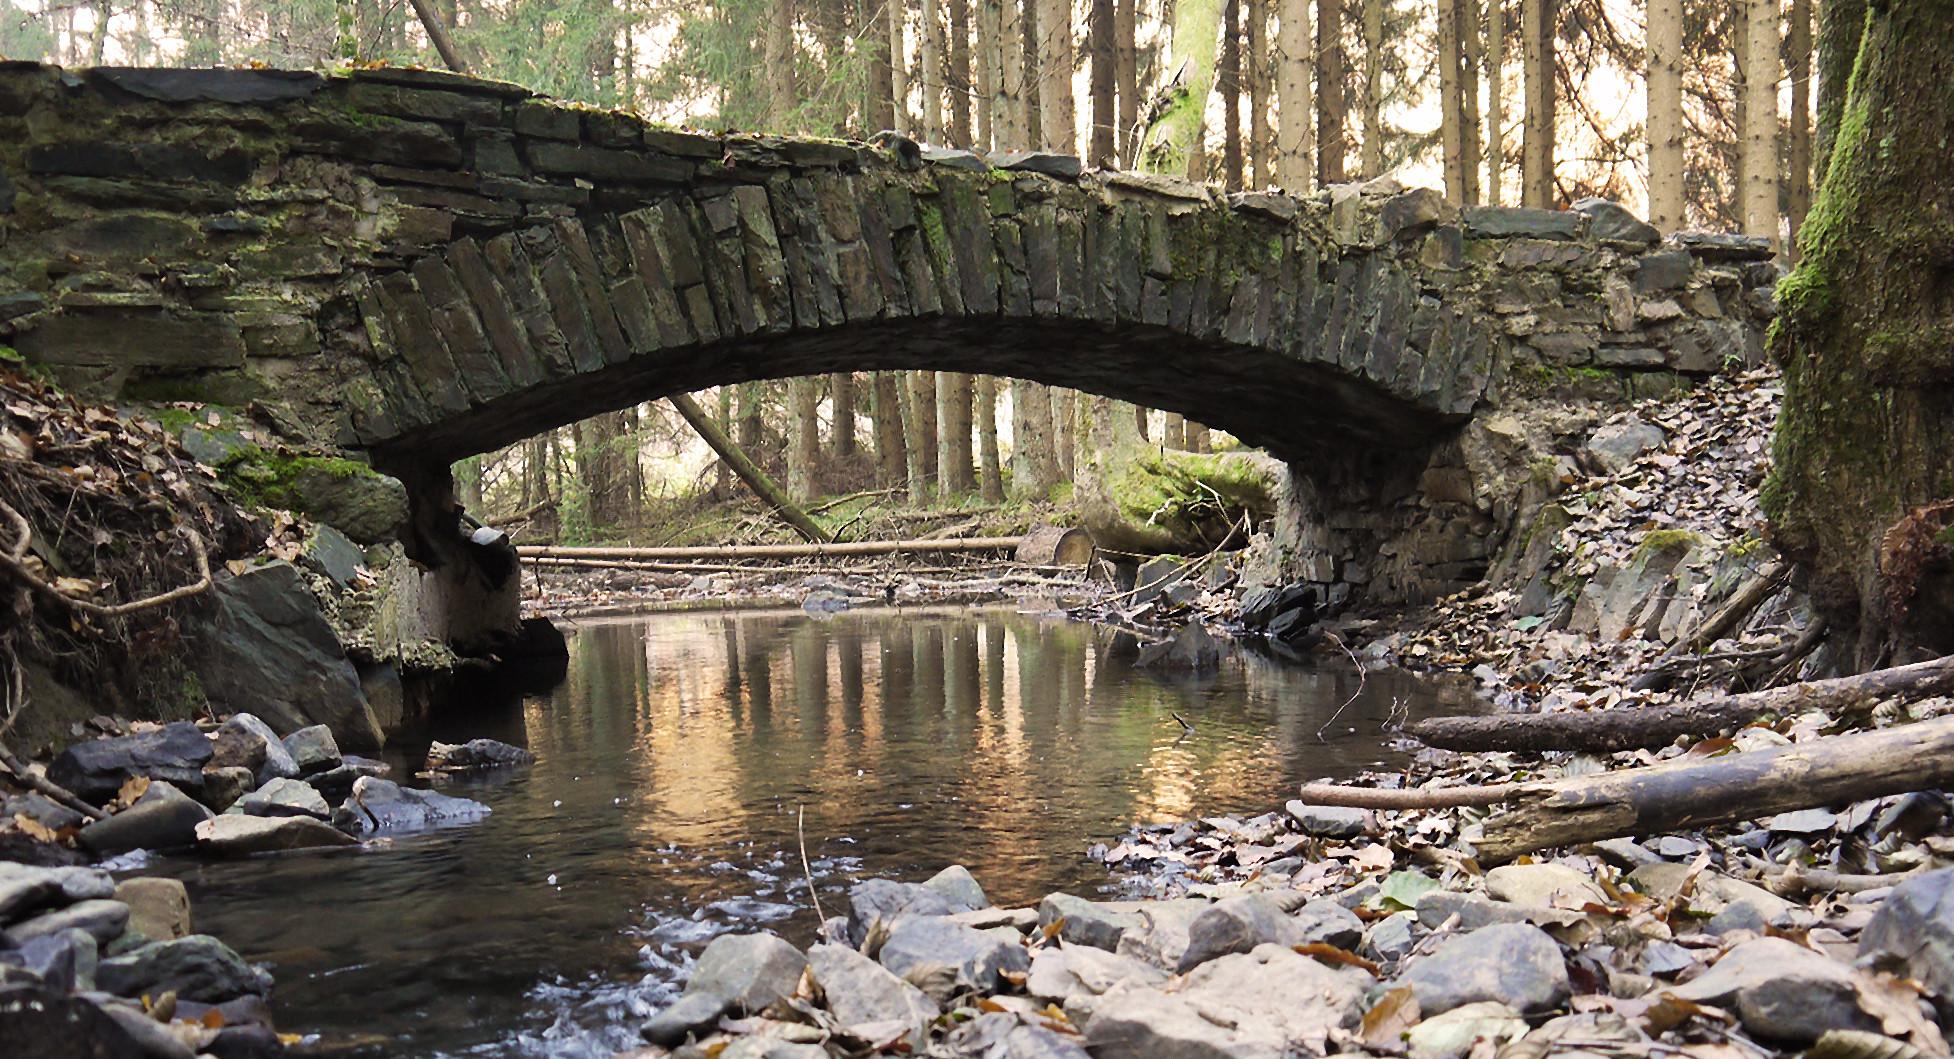 Brücke im Wald neu